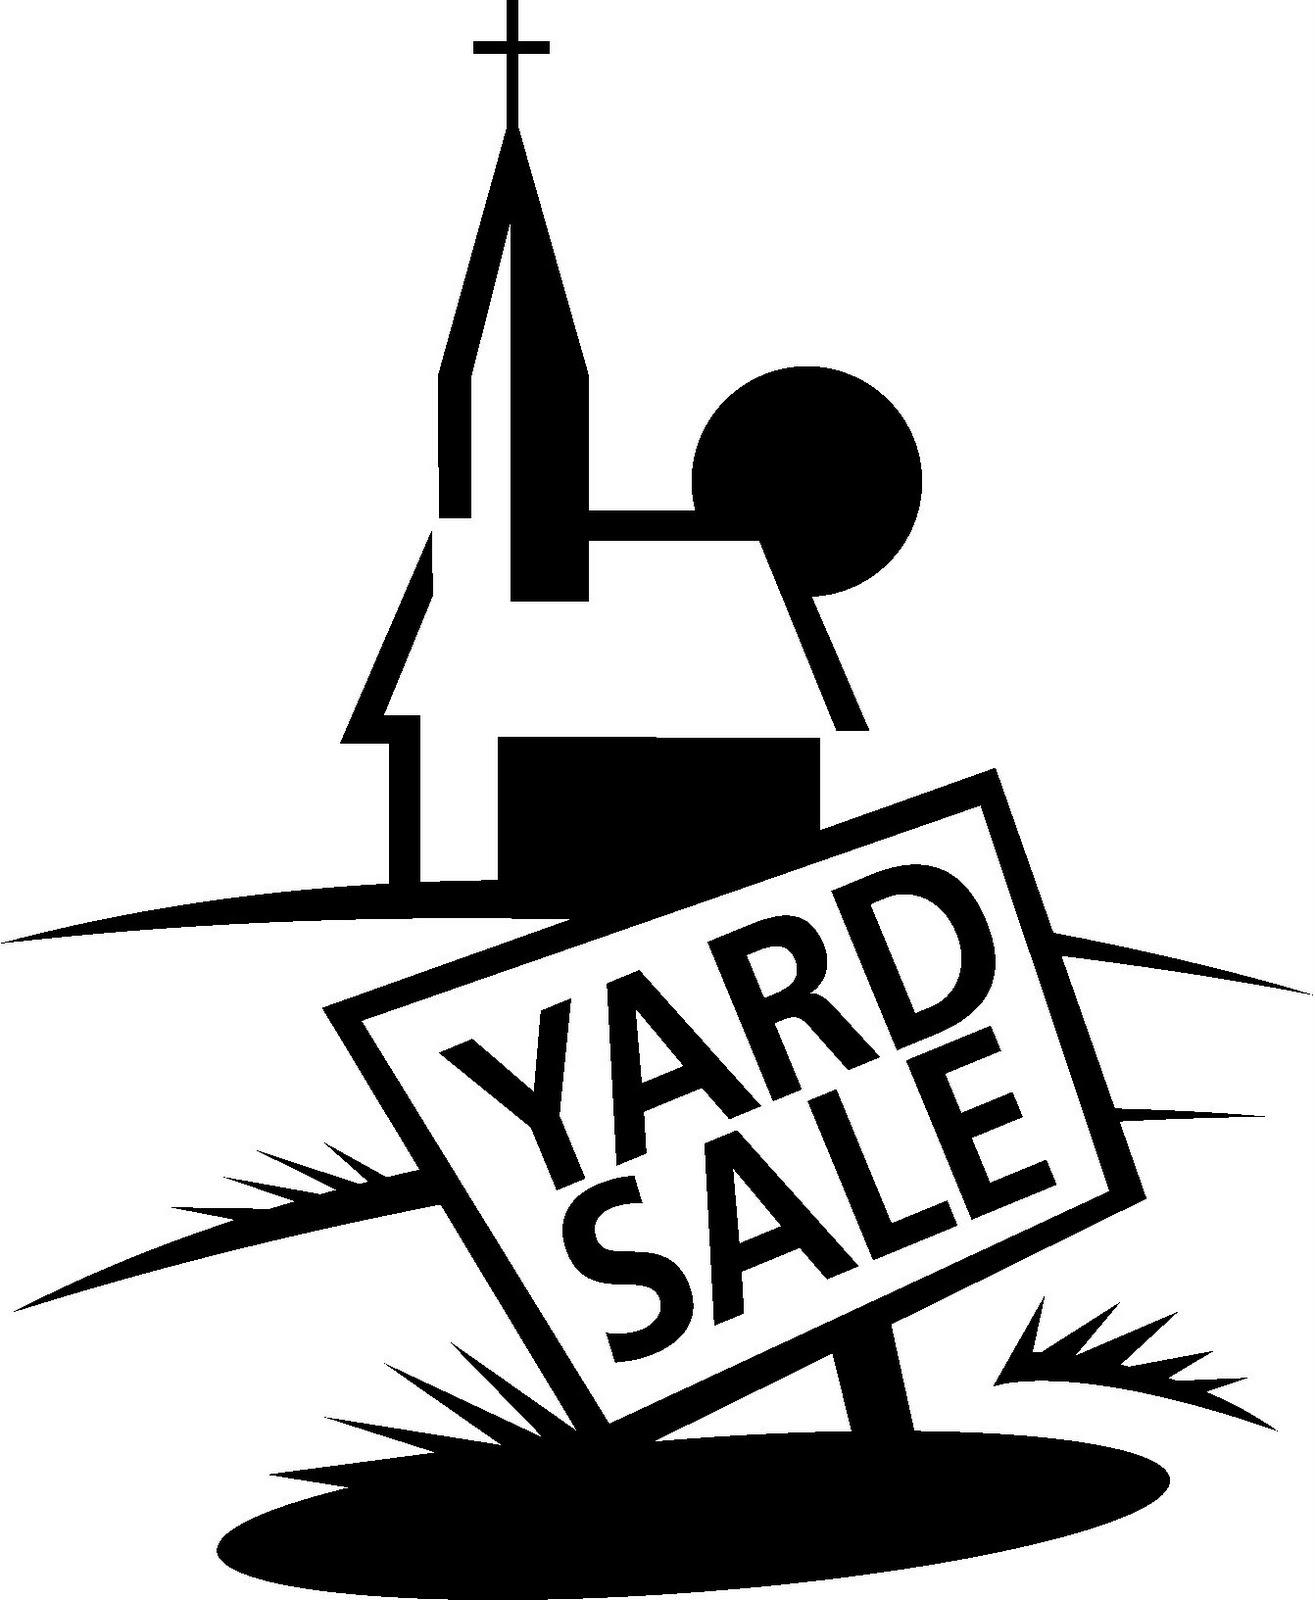 hampton news st mark s lutheran church ol  country bazaar Yard Sale Clip Art Black and White Bake Sale Graphics